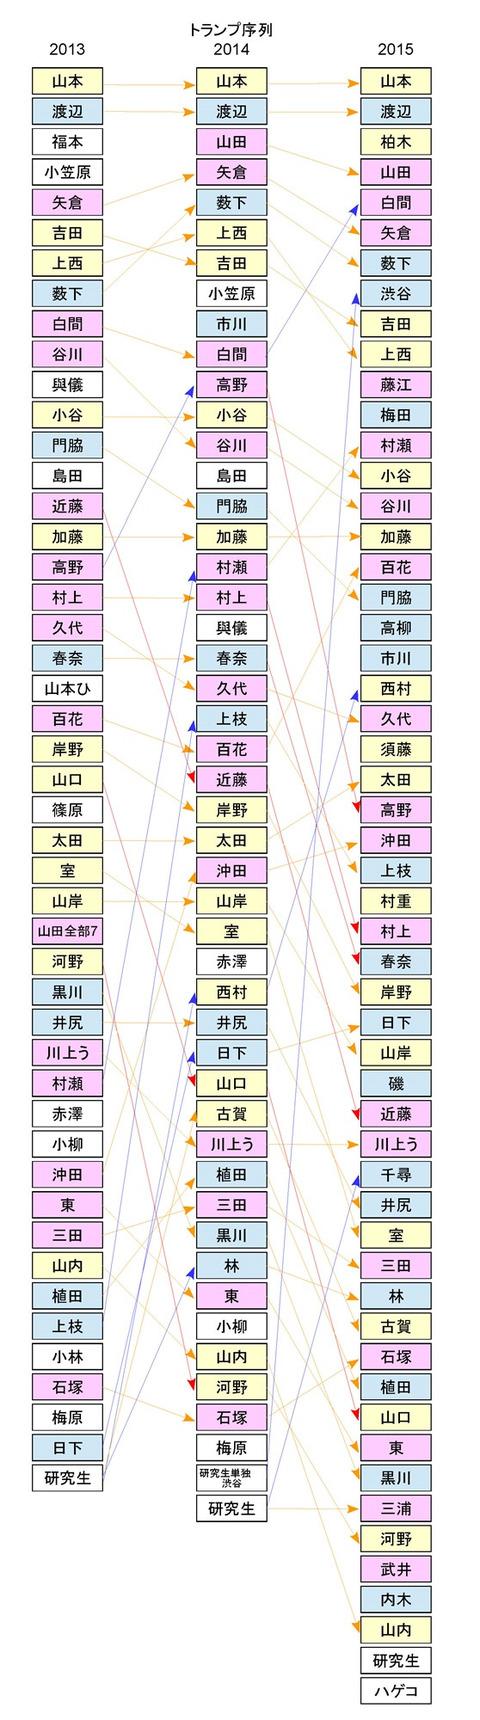 【NMB48】2年前と今の序列変動が割とリアル